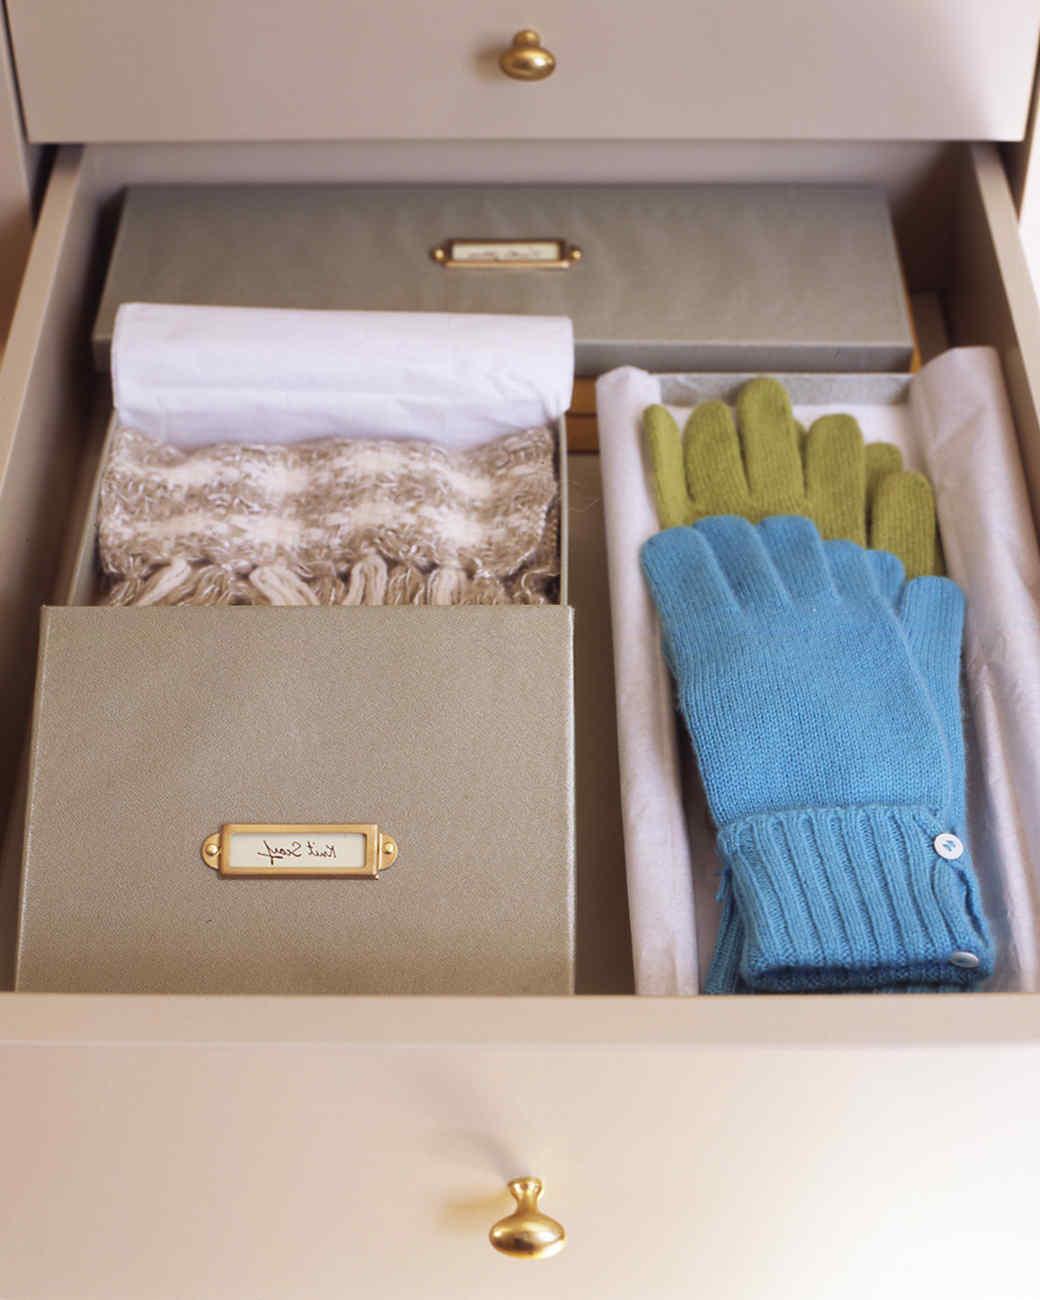 mla_104332_0109_gloves.jpg